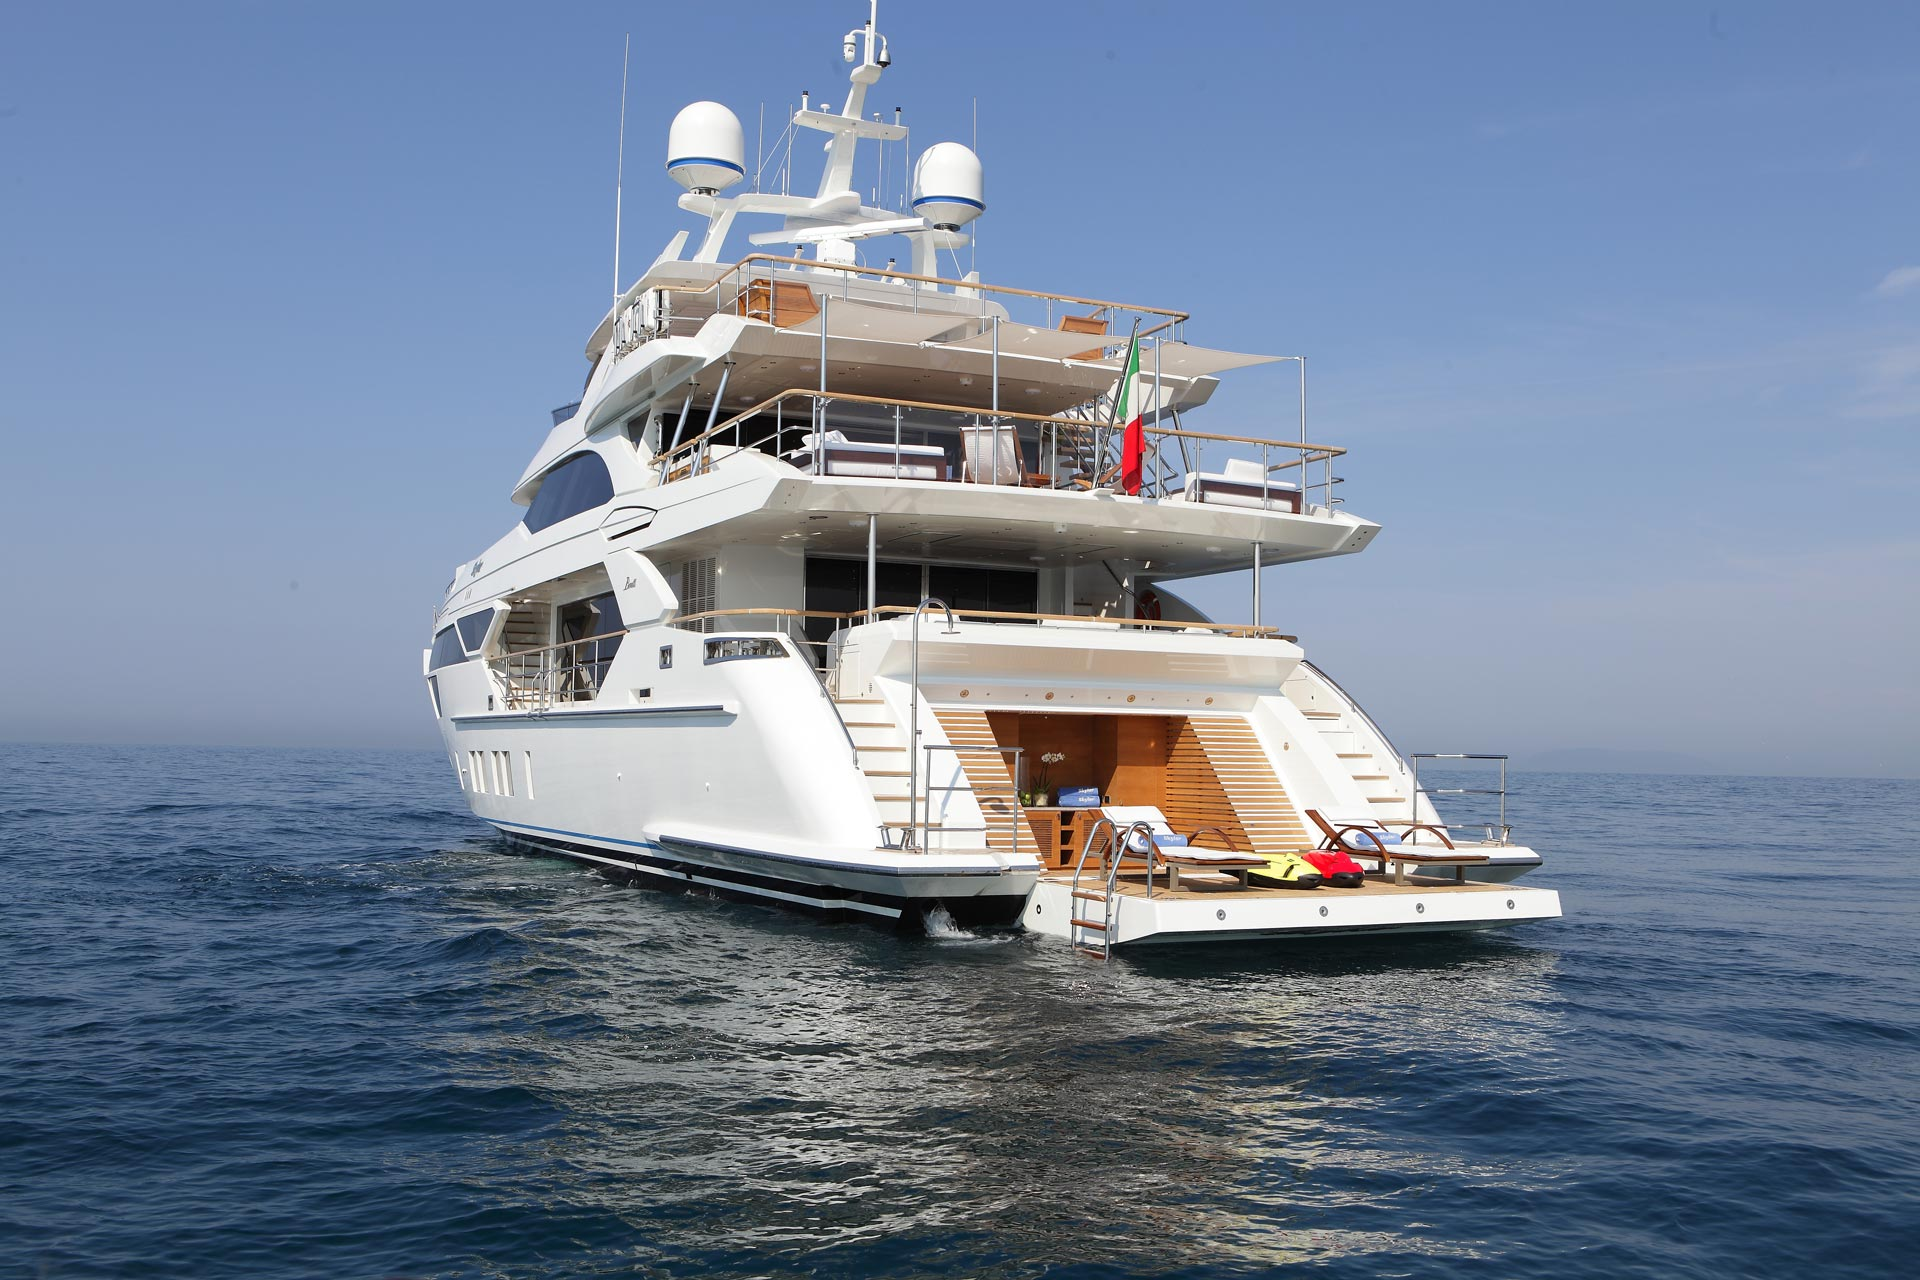 Benetti Superyacht Skyler Beach Club Yacht Charter Superyacht News